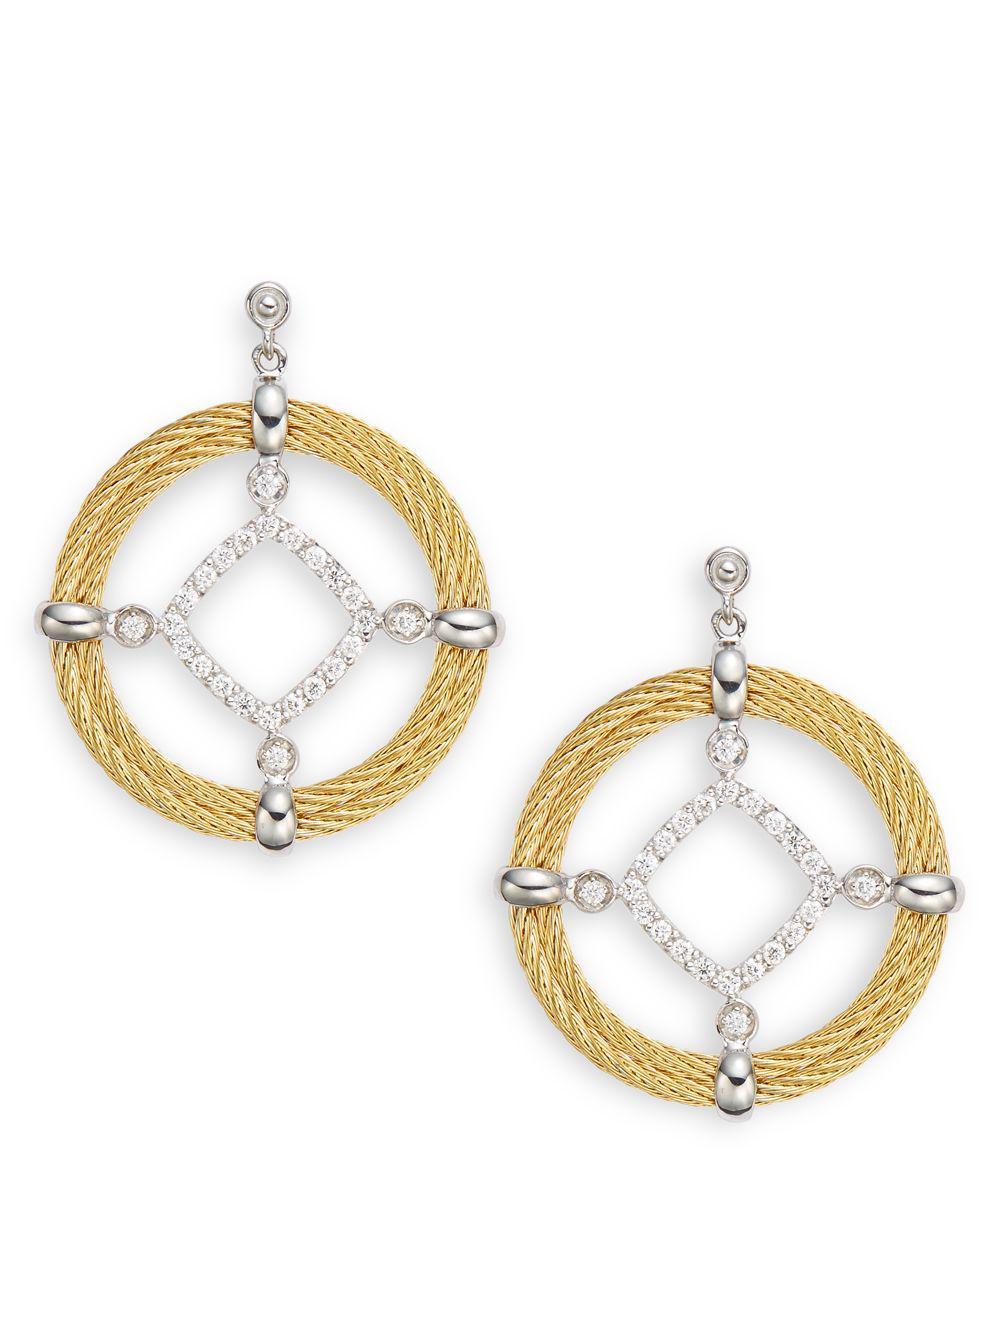 ddc1b05cb0e8d Lyst - Alor Diamond, 18k Yellow Gold, Stainless Steel Cross Drop ...